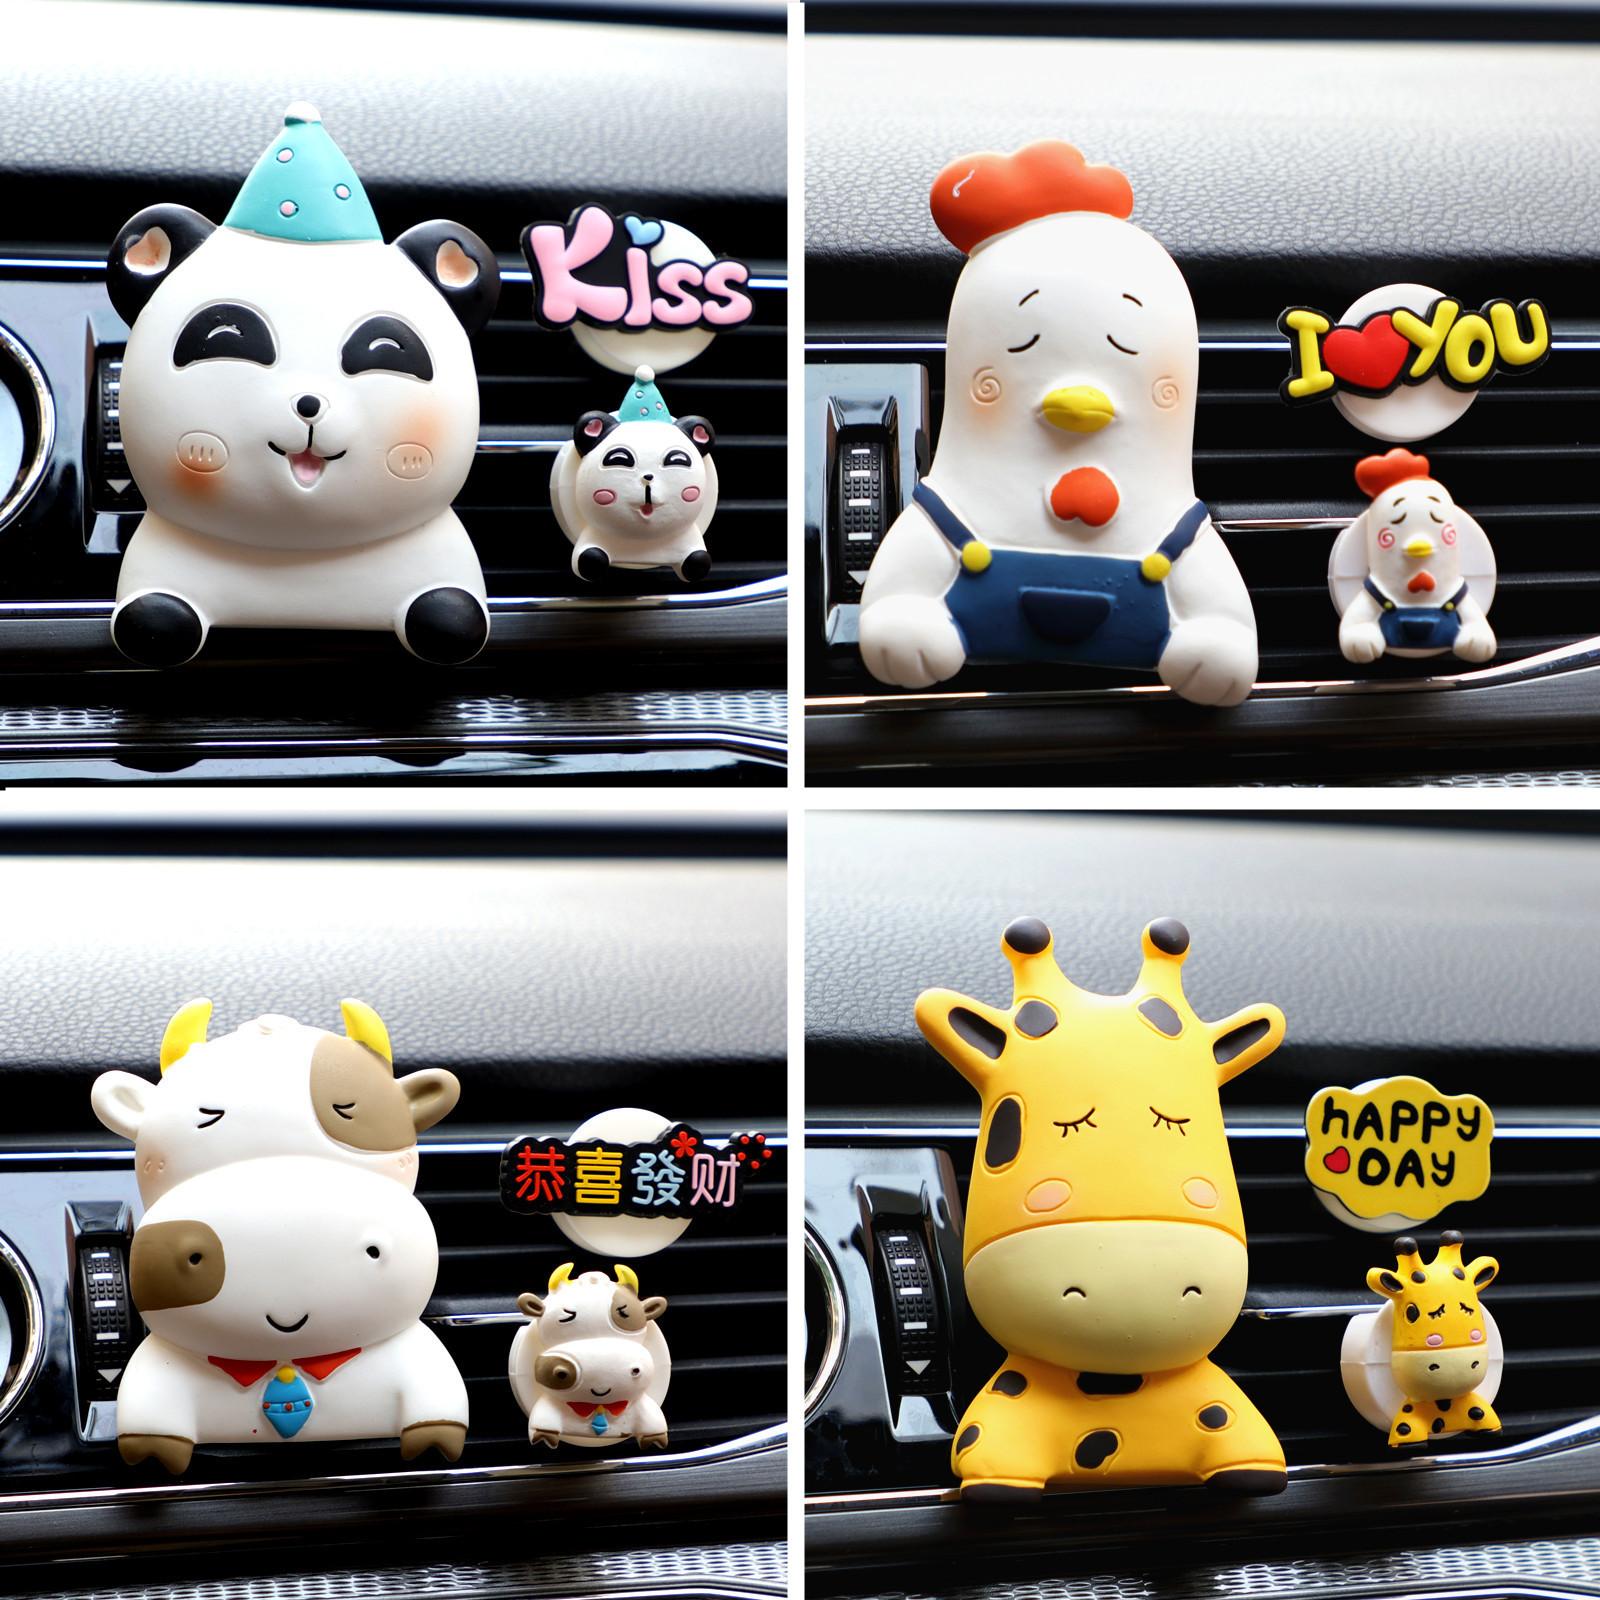 Creative Car Aircon Decoration for Gift Ideas